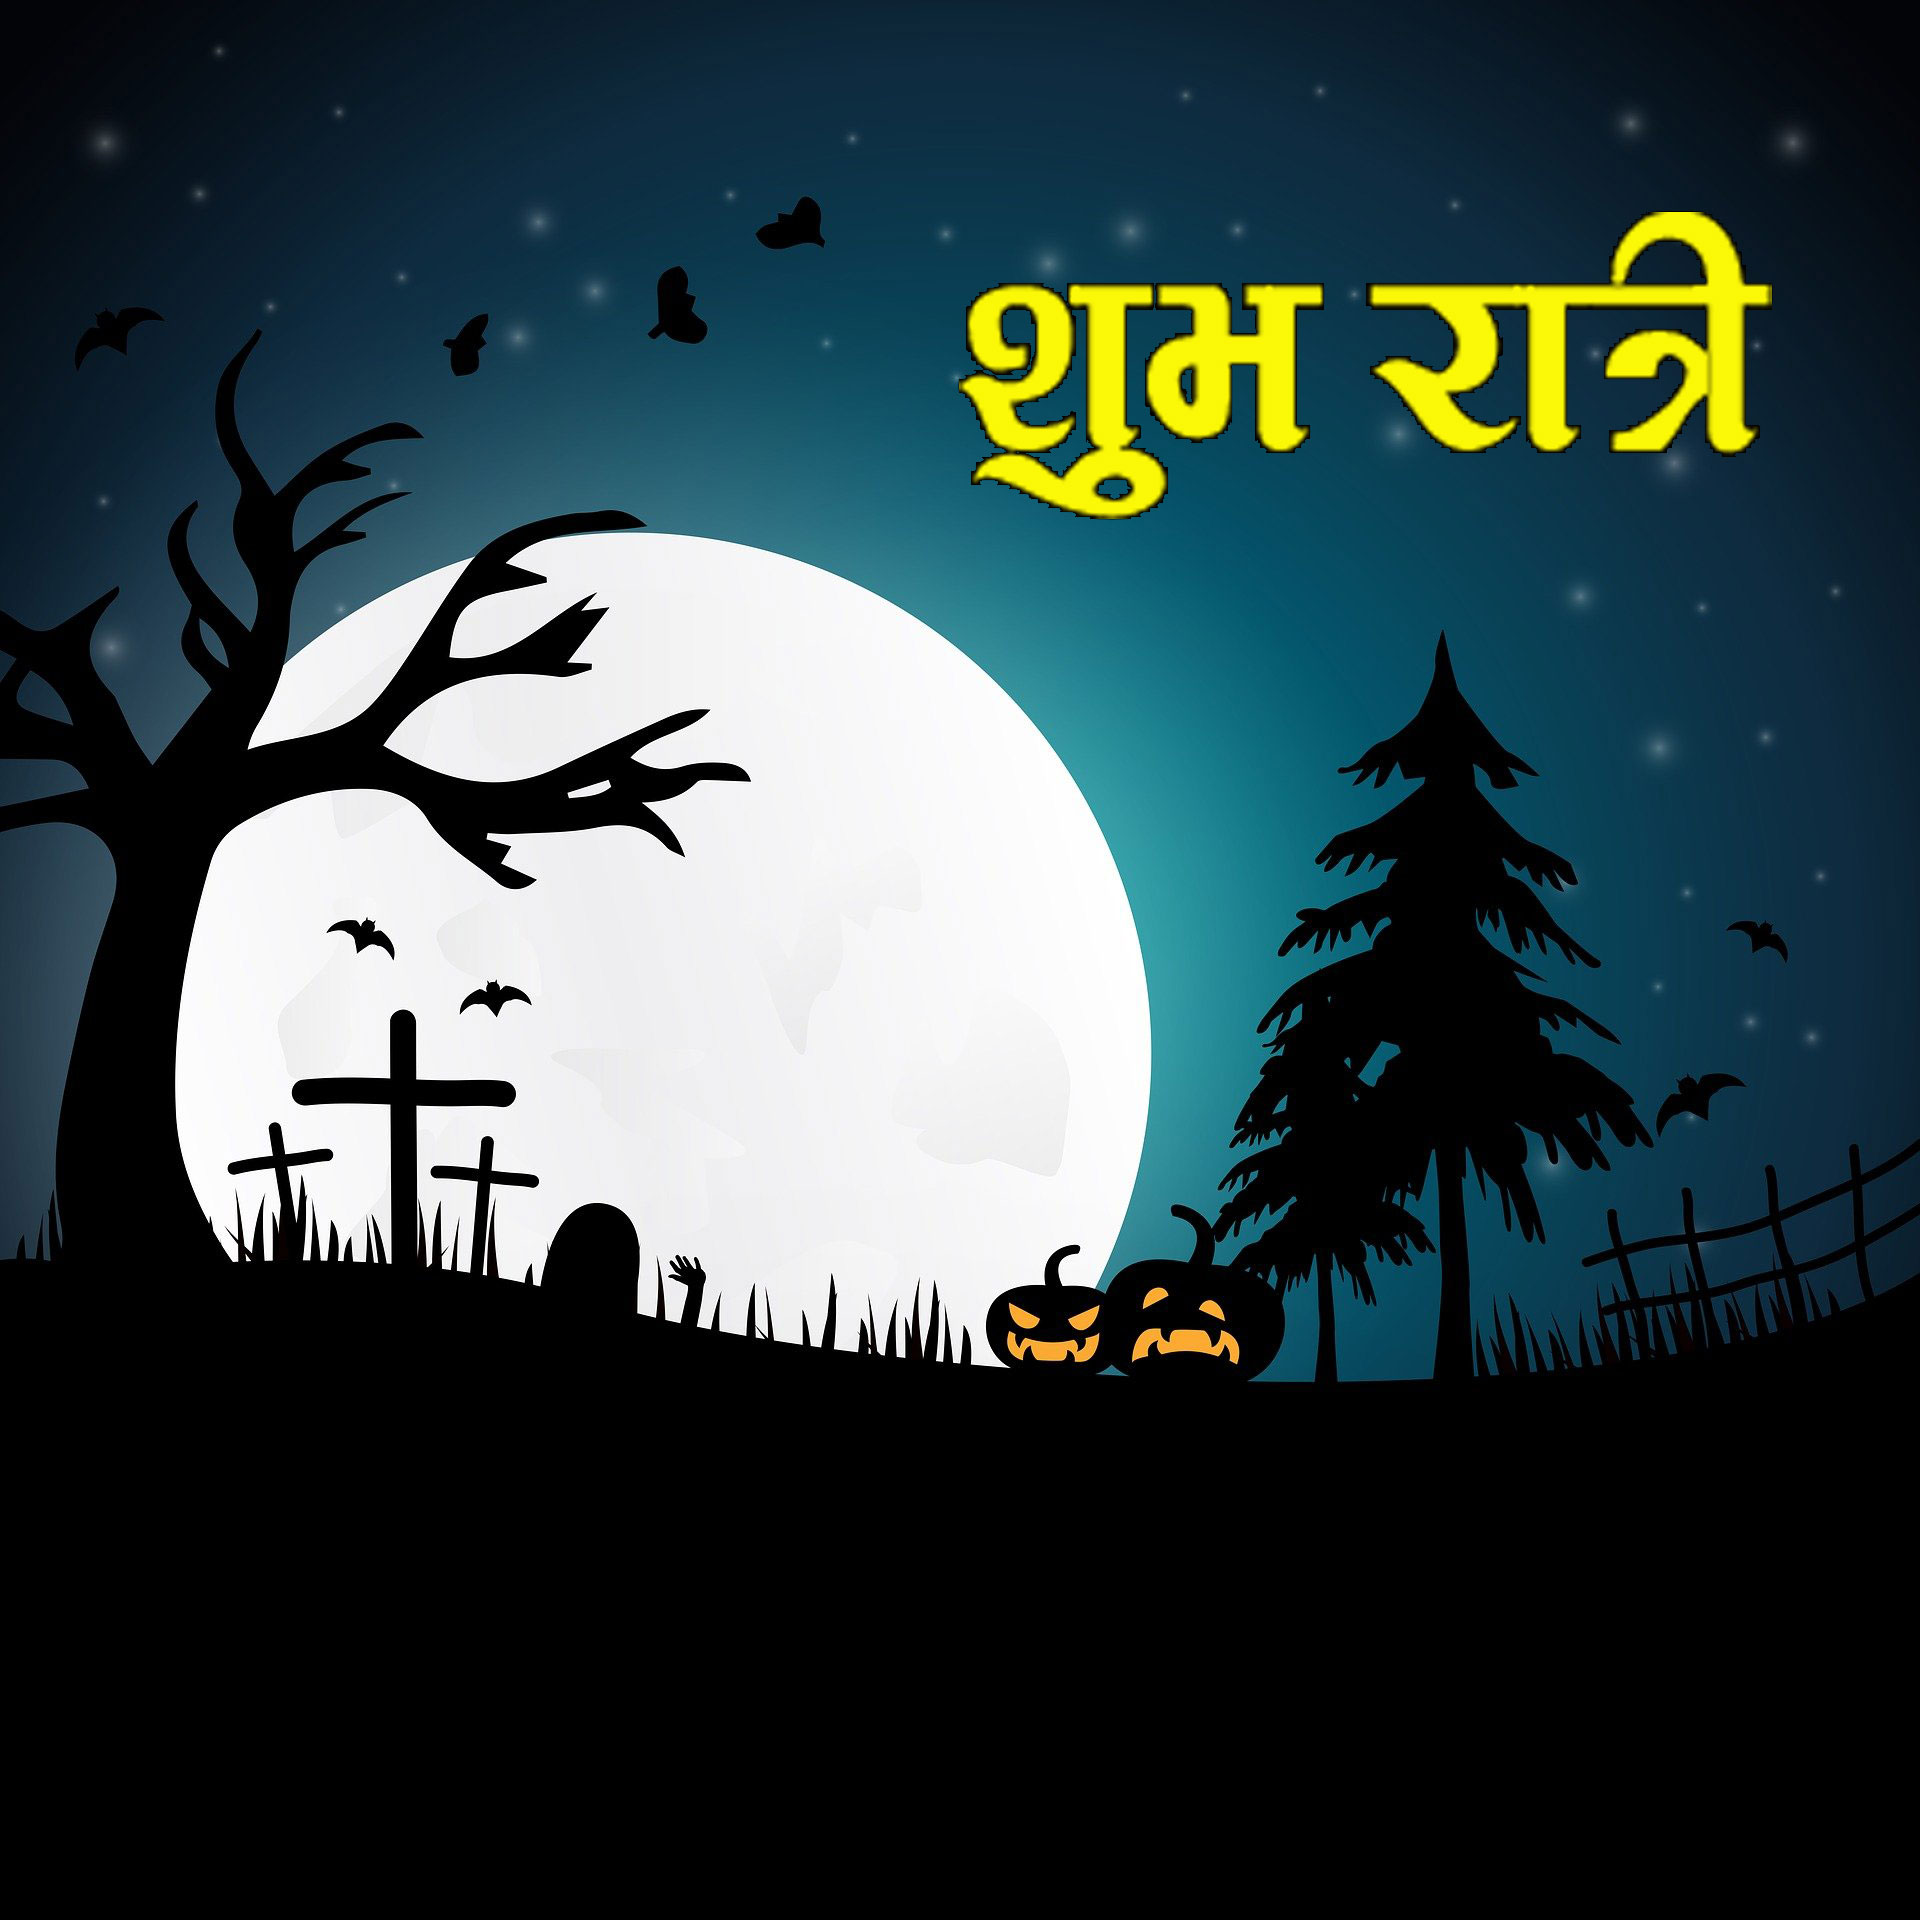 Beautiful Subh Ratri Images photo pics hd